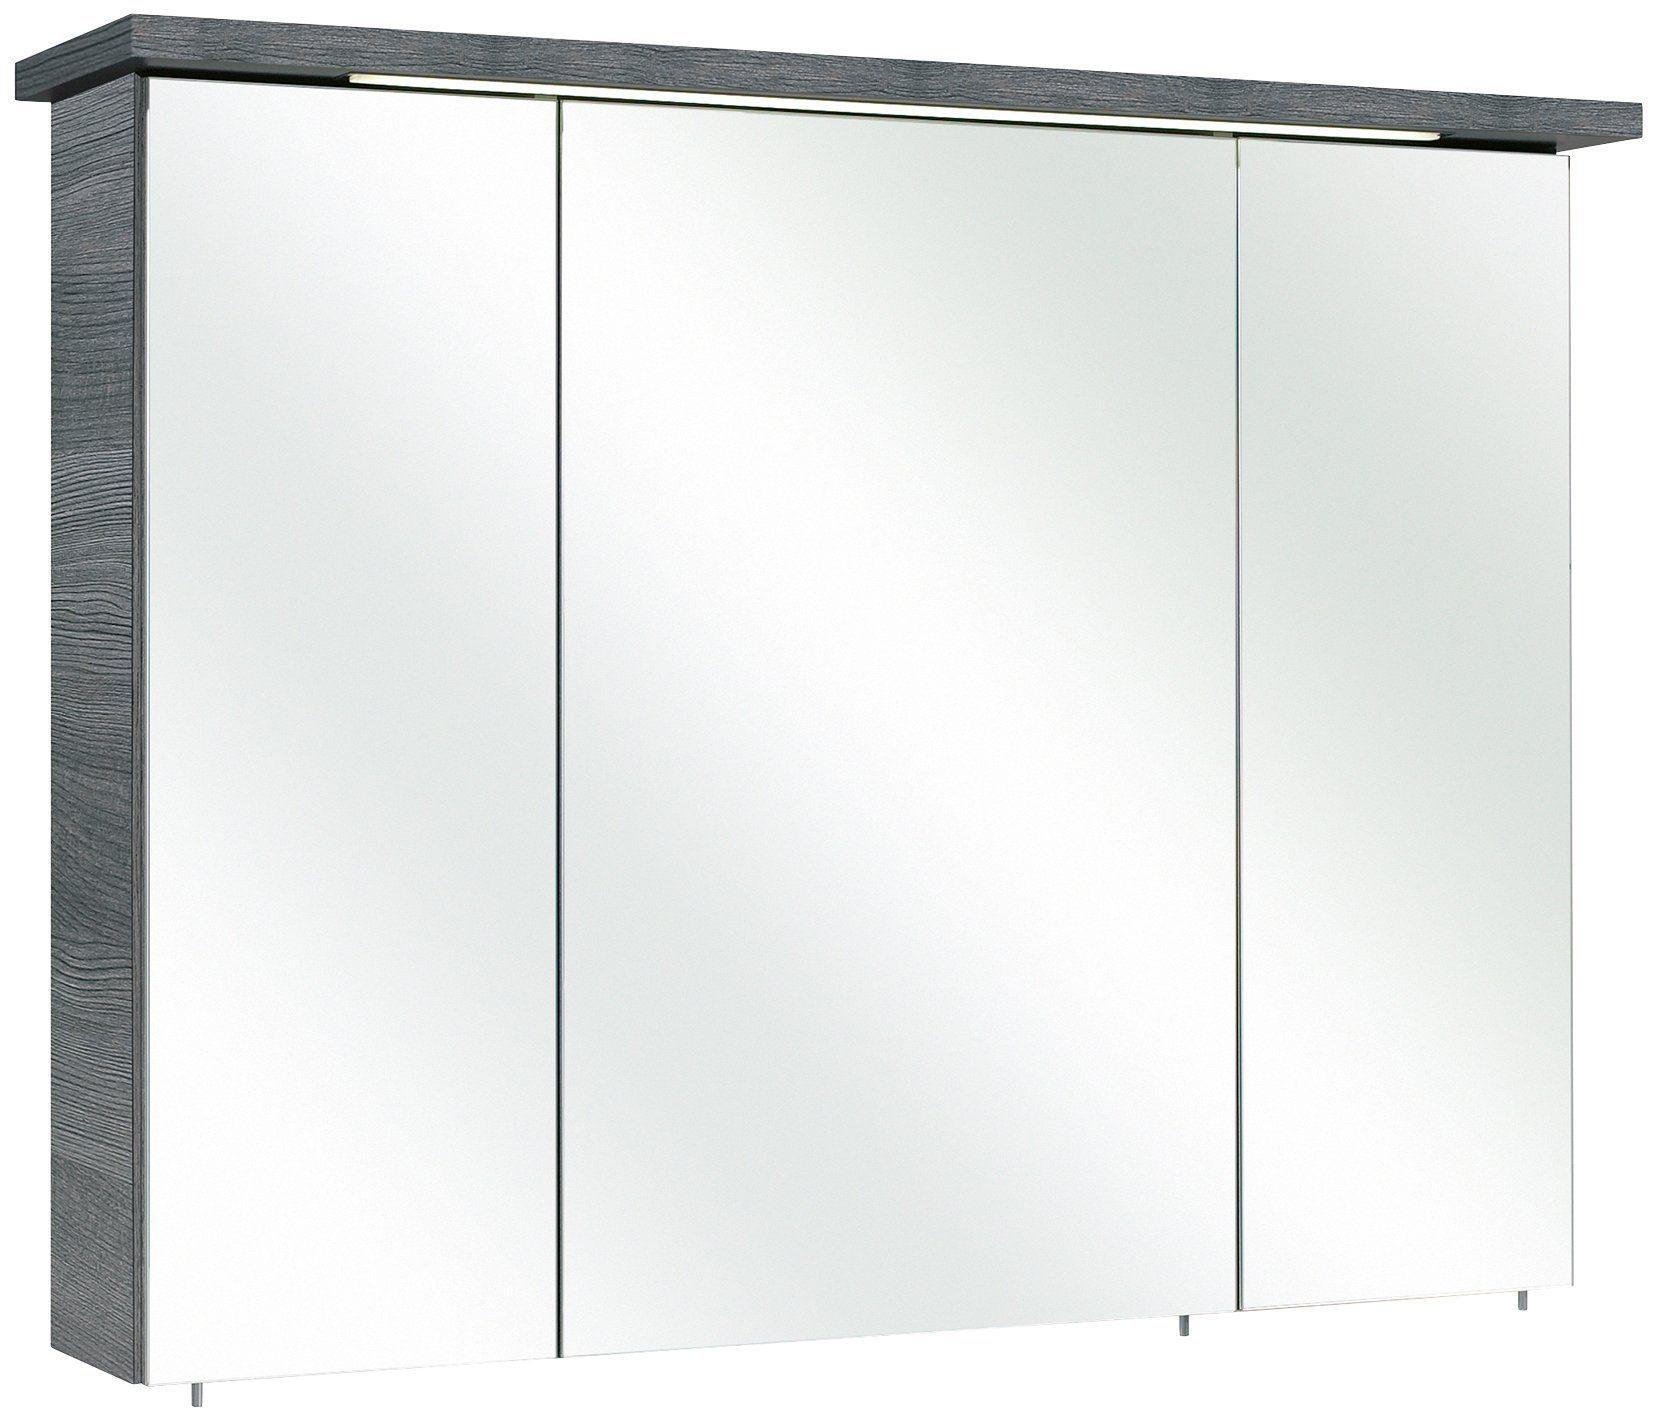 PELIPAL Spiegelschrank »Alika«, LED, Breite 75 cm